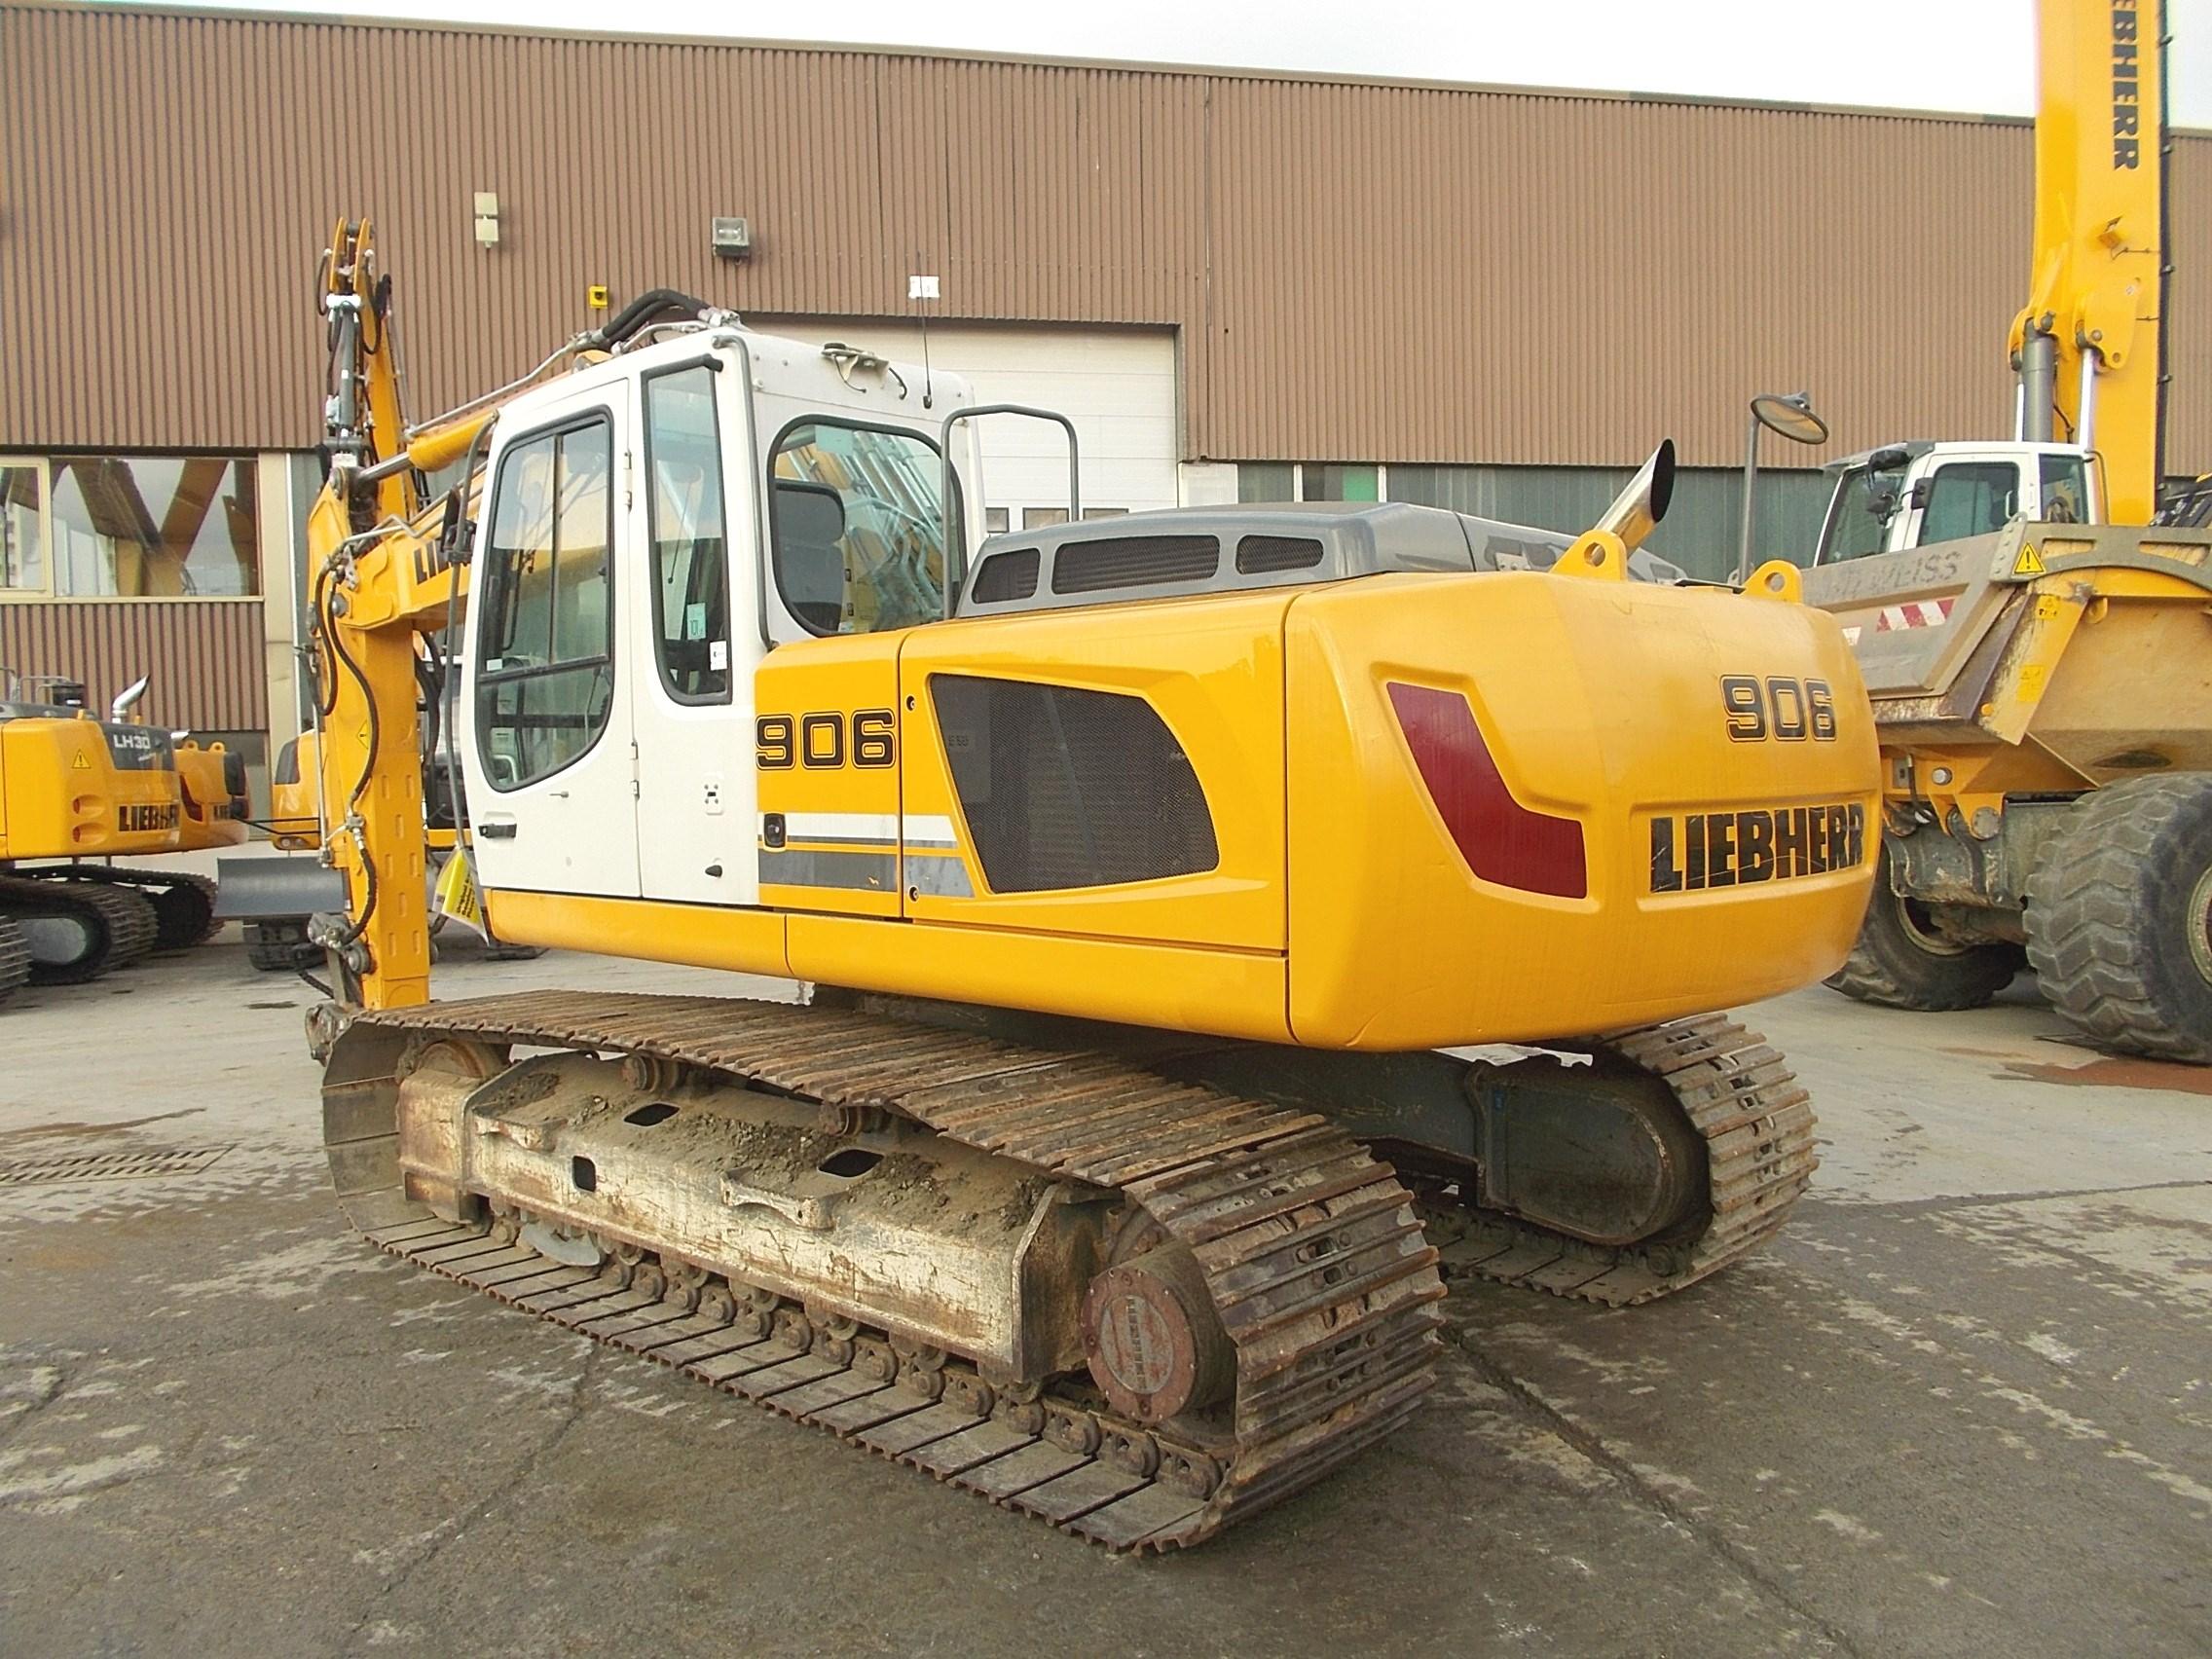 R 906 Classic LC-1283-31975_002.JPG